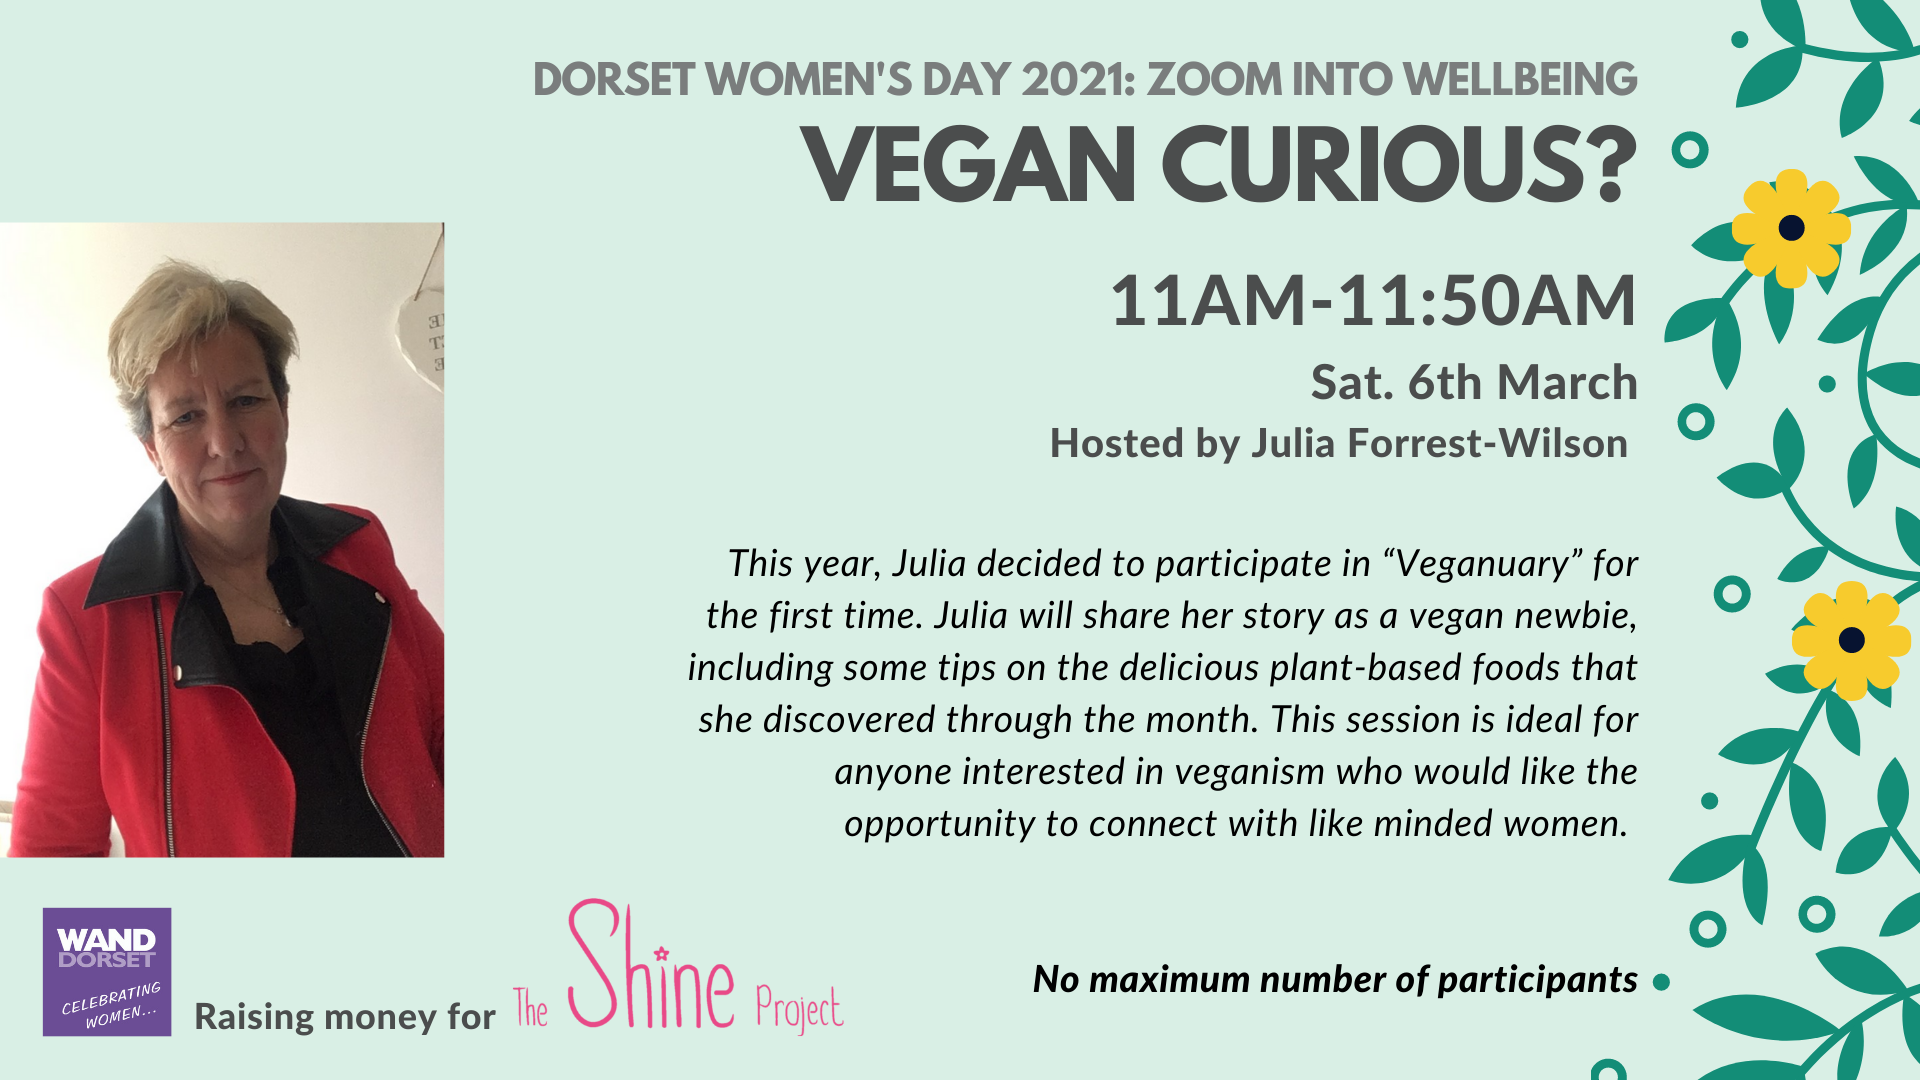 Dorset Women's Day 2021: Vegan Curious?